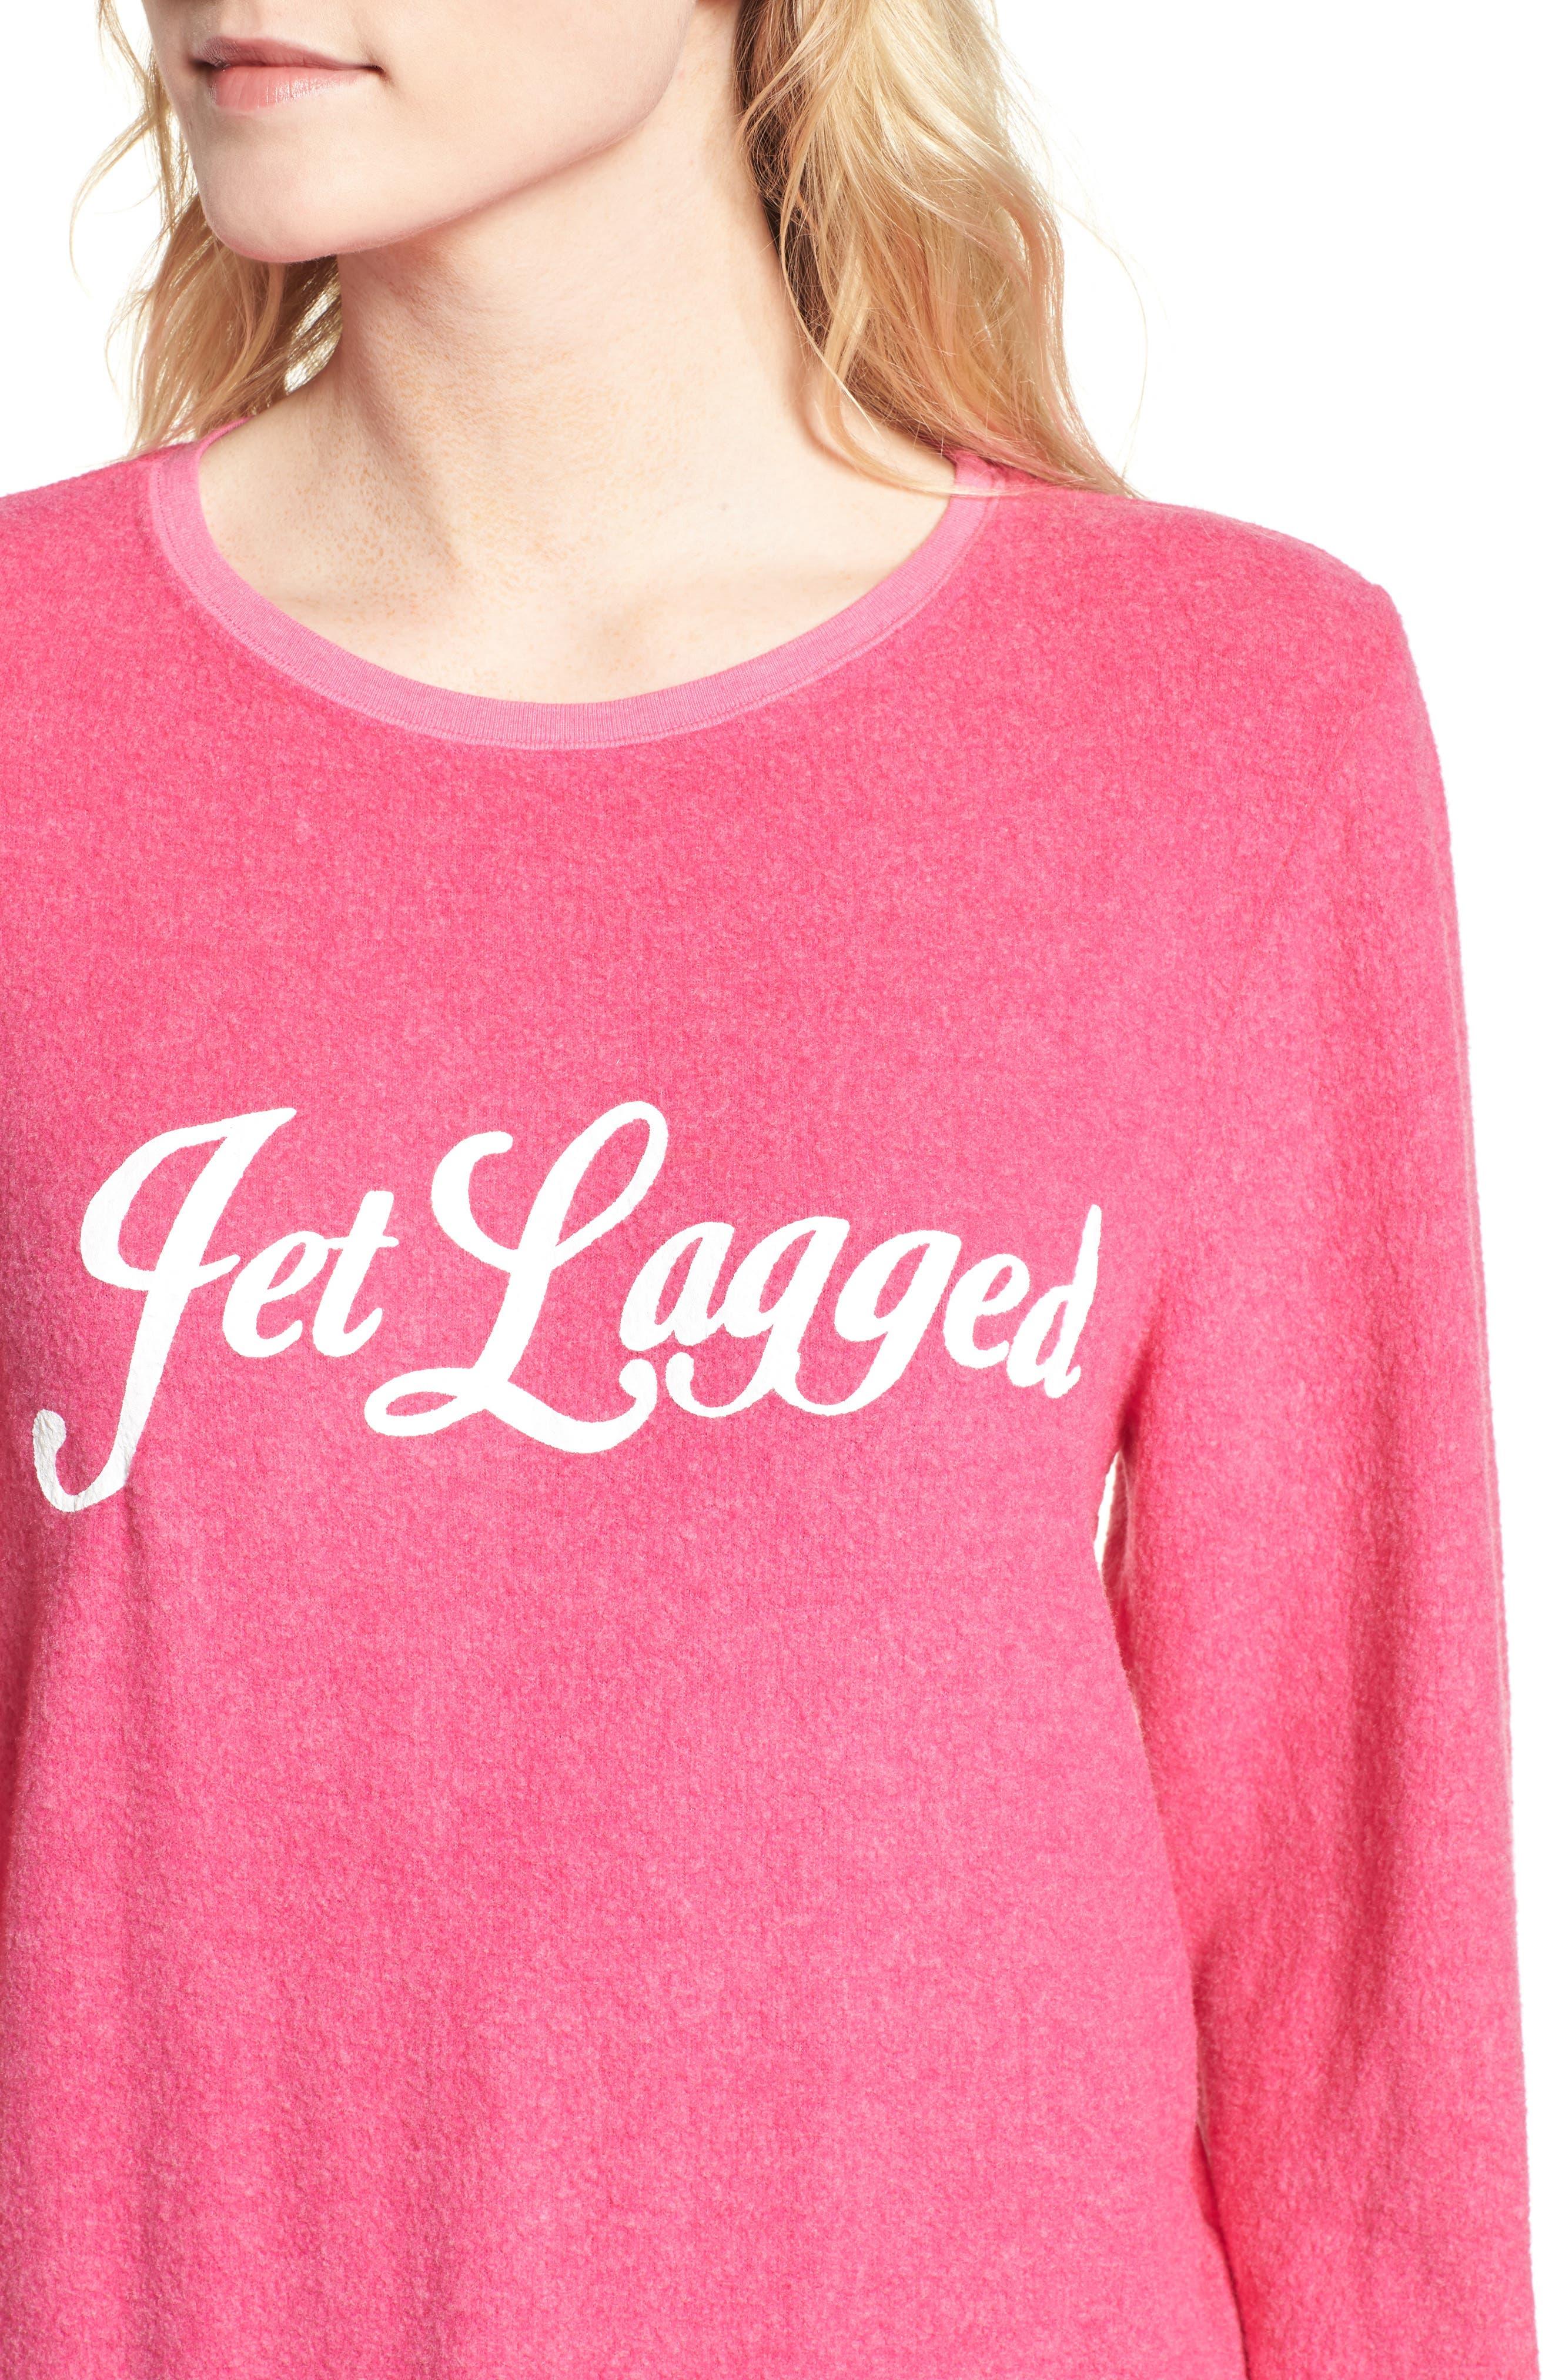 Jet Lagged Sweatshirt,                             Alternate thumbnail 4, color,                             Malibu Pink